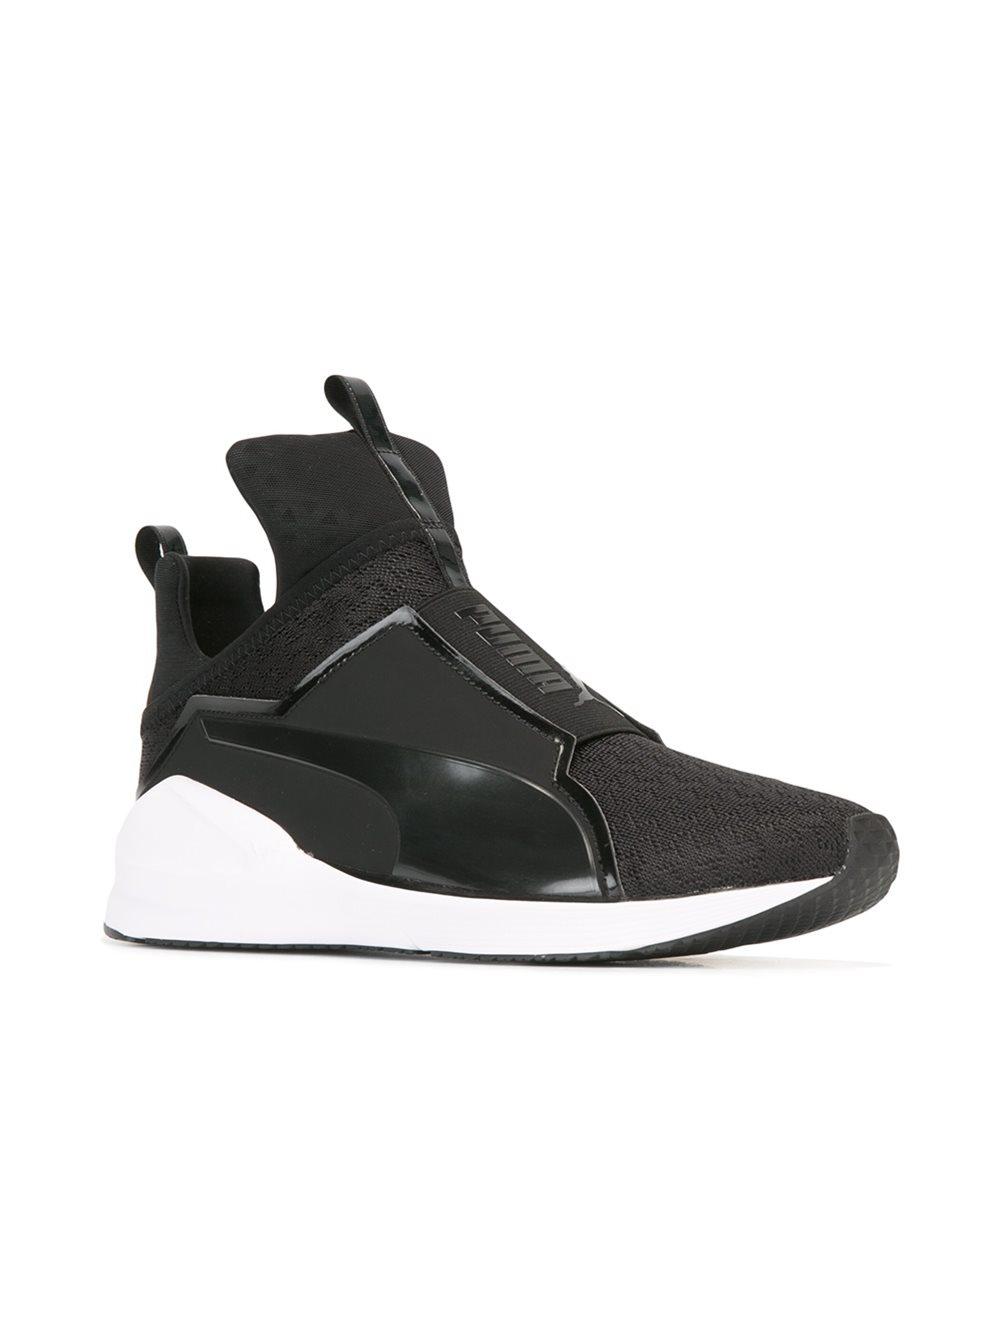 lyst puma slip on sneakers in black. Black Bedroom Furniture Sets. Home Design Ideas